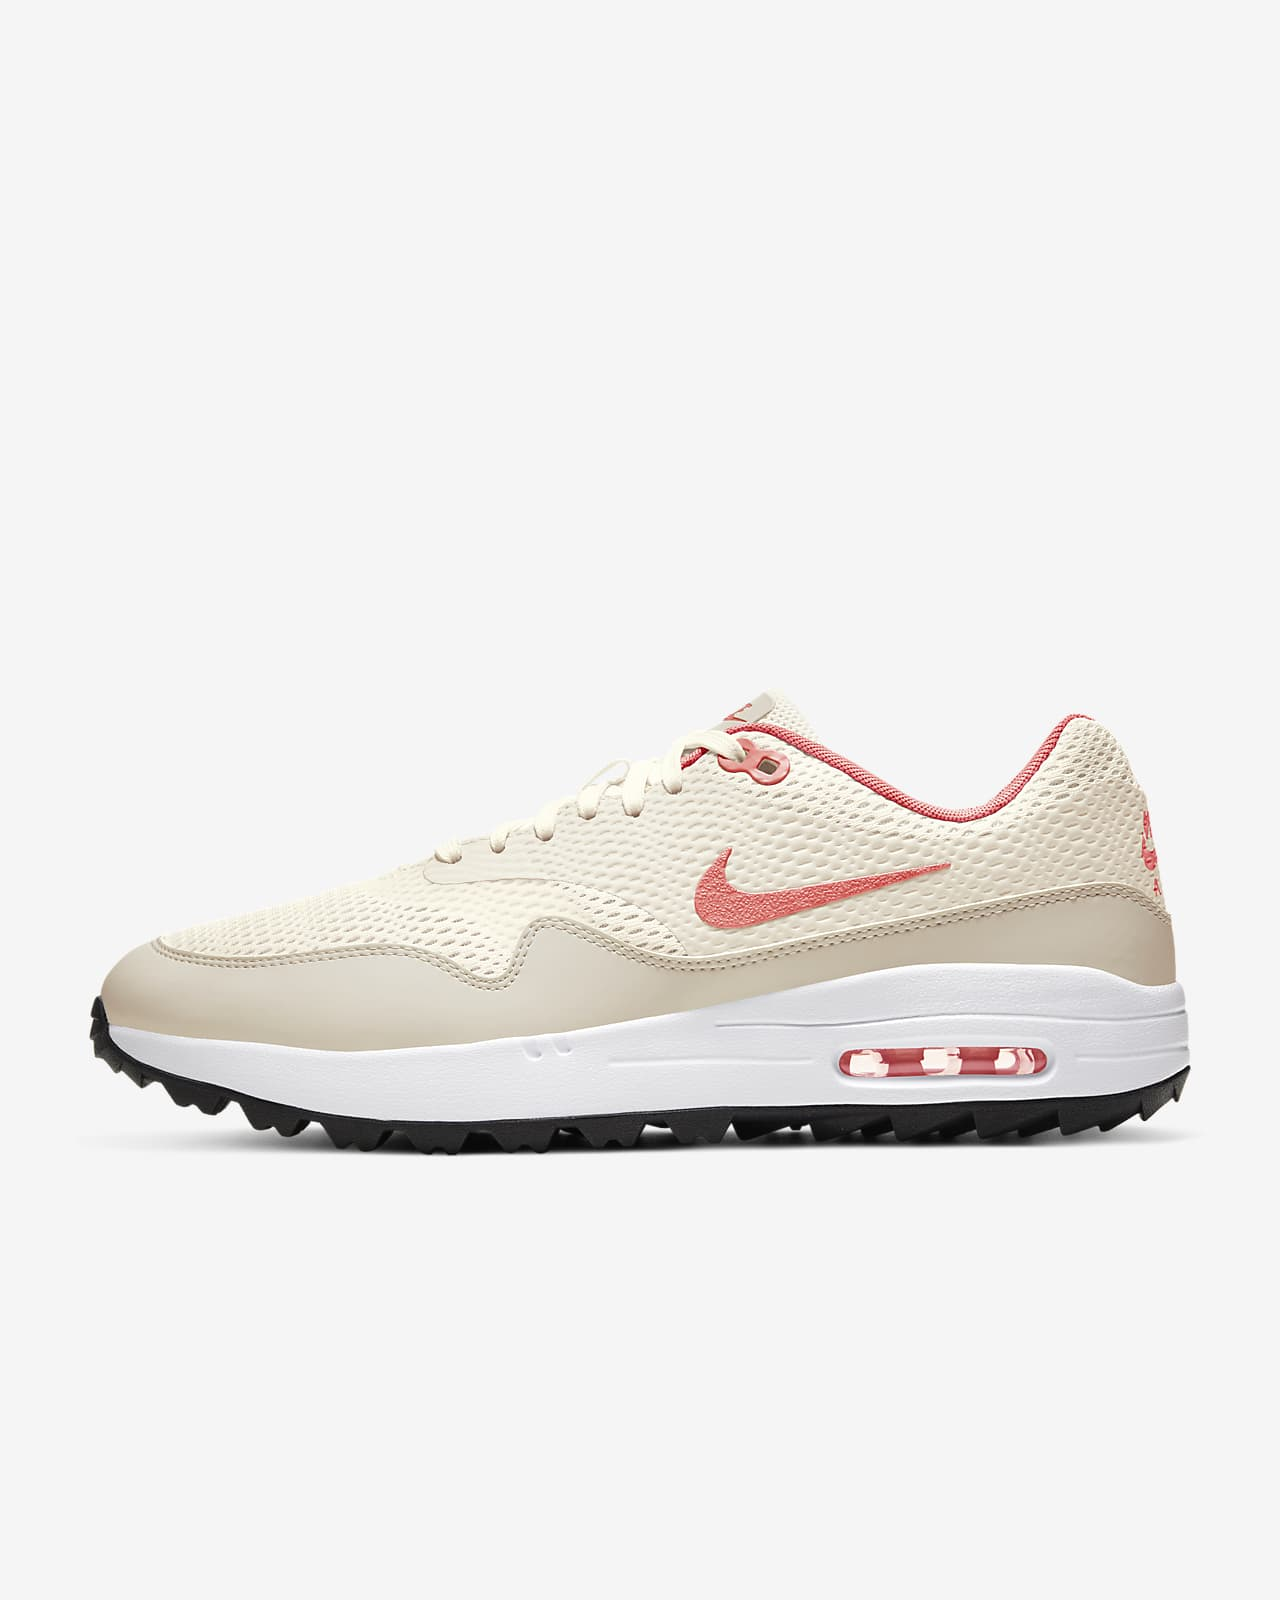 Nike Air Max 1 G Men's Golf Shoes. Nike JP